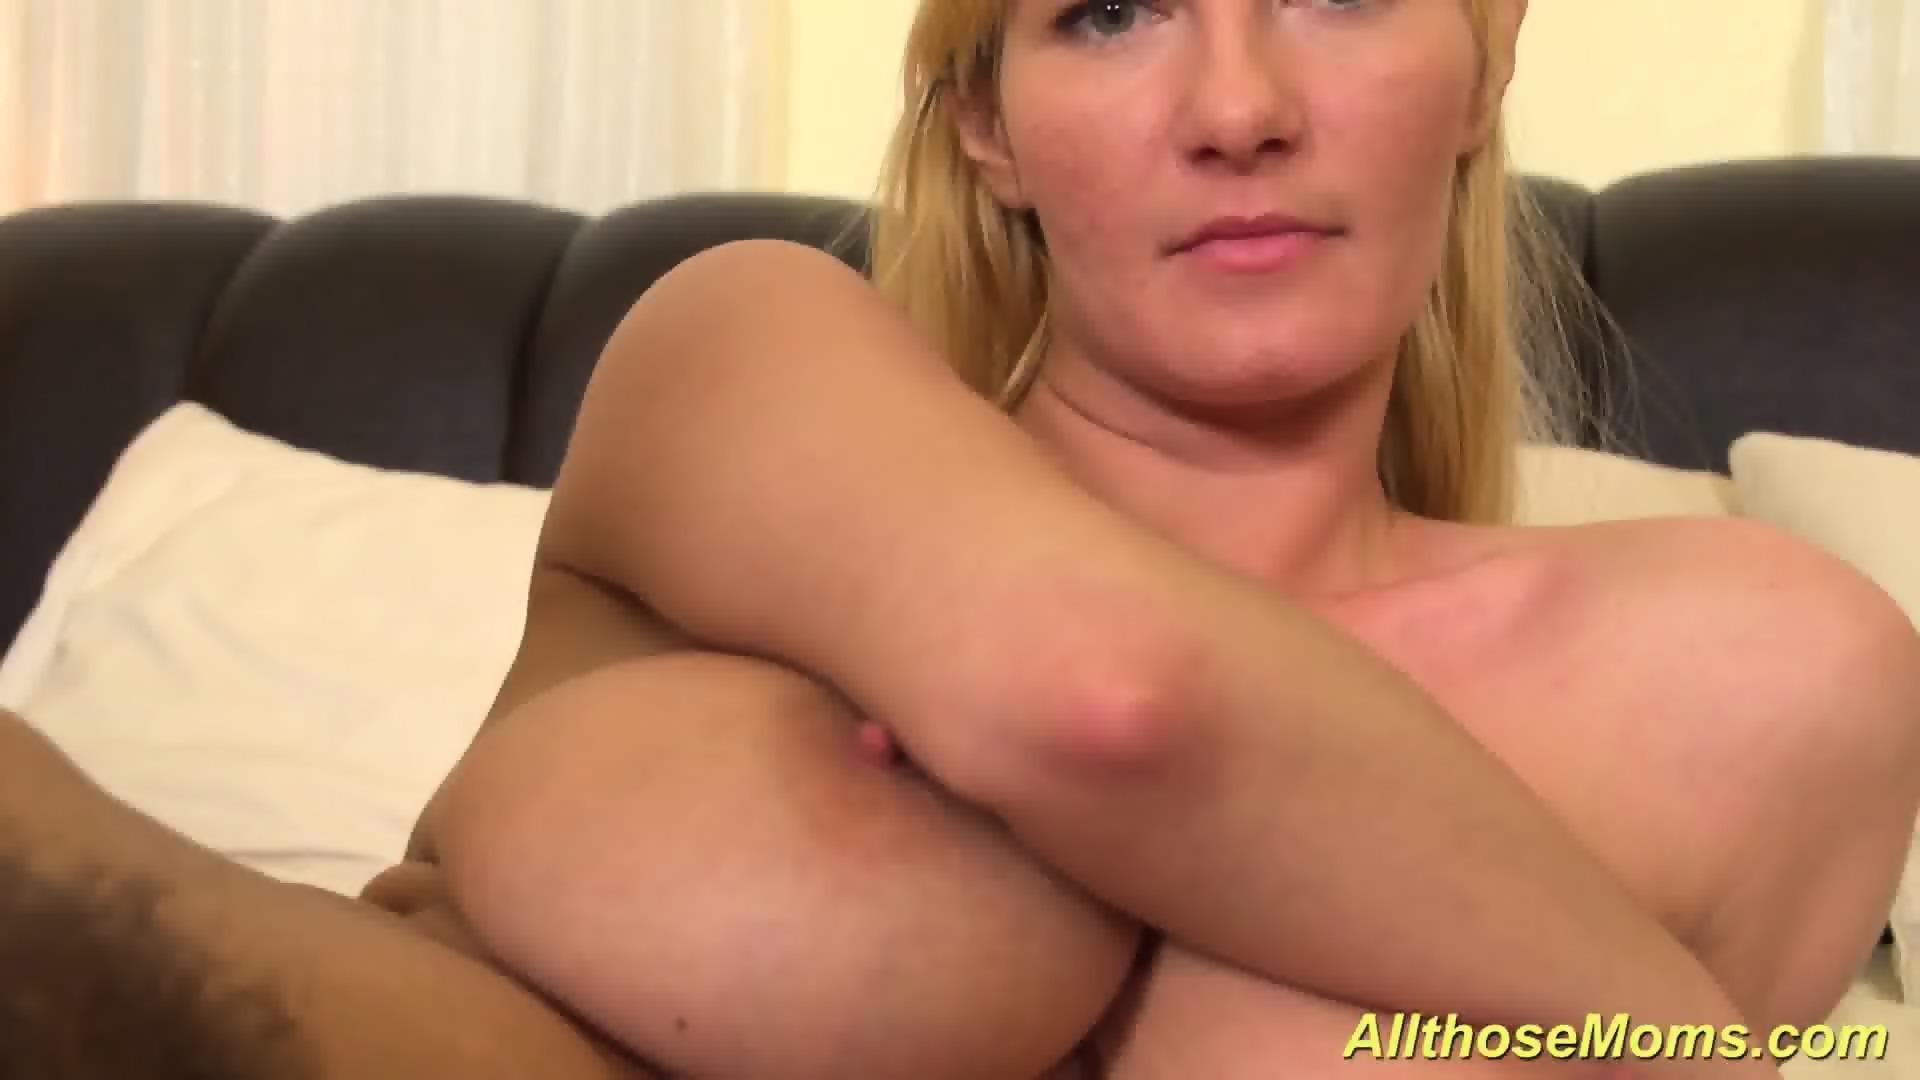 Biggest cock shagging woman